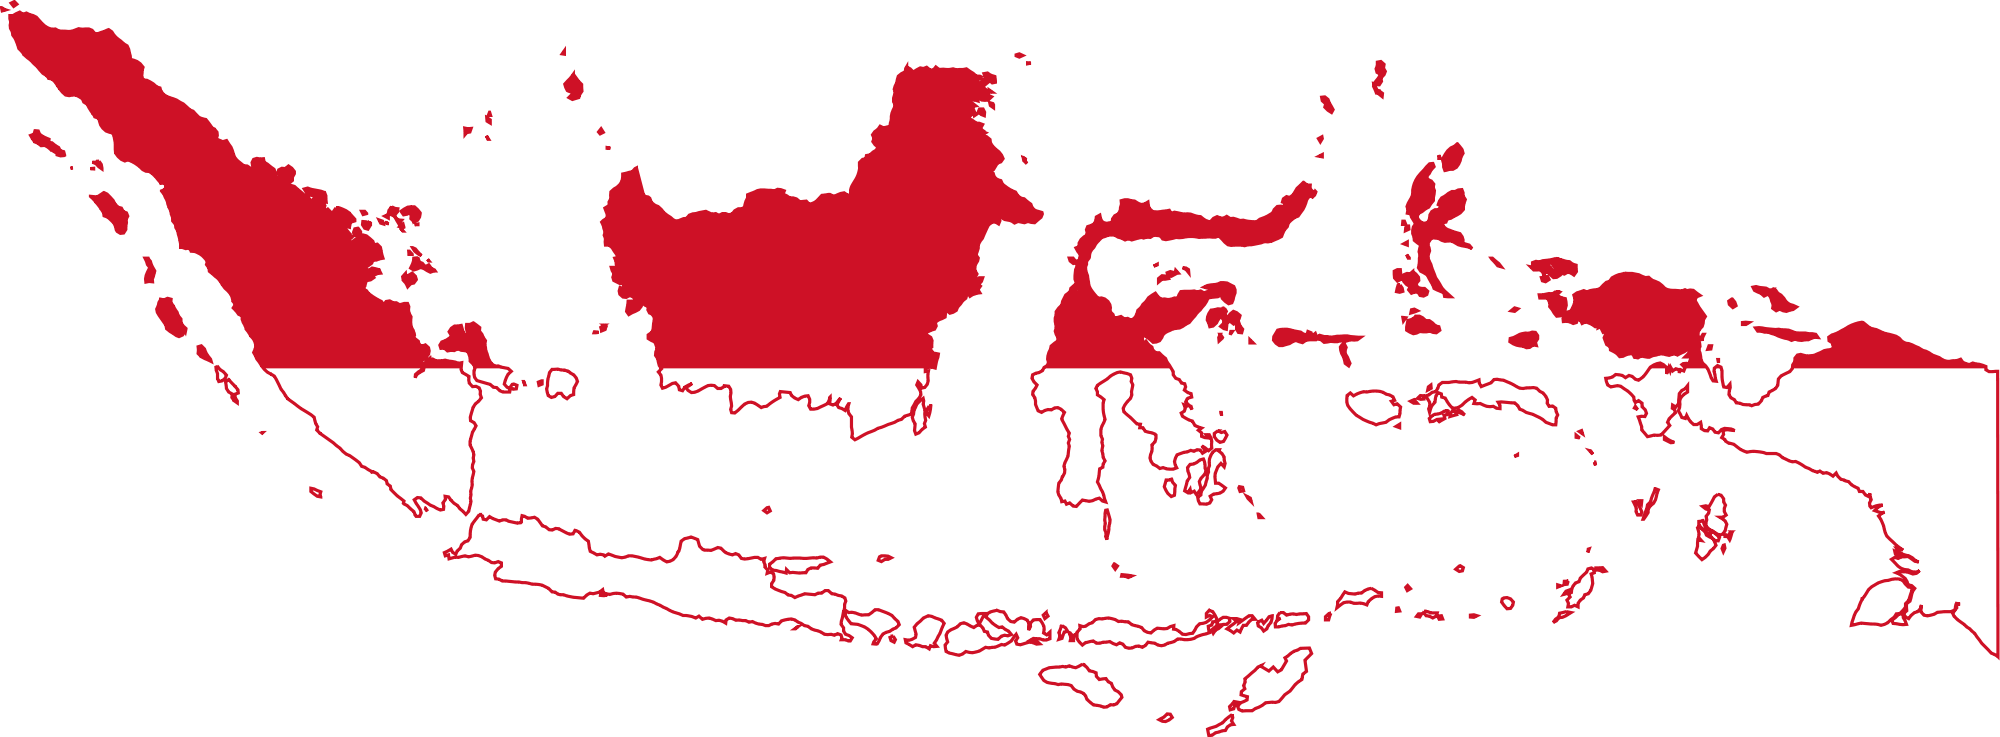 Peta Indonesia Merah Putih Wgs Engineering